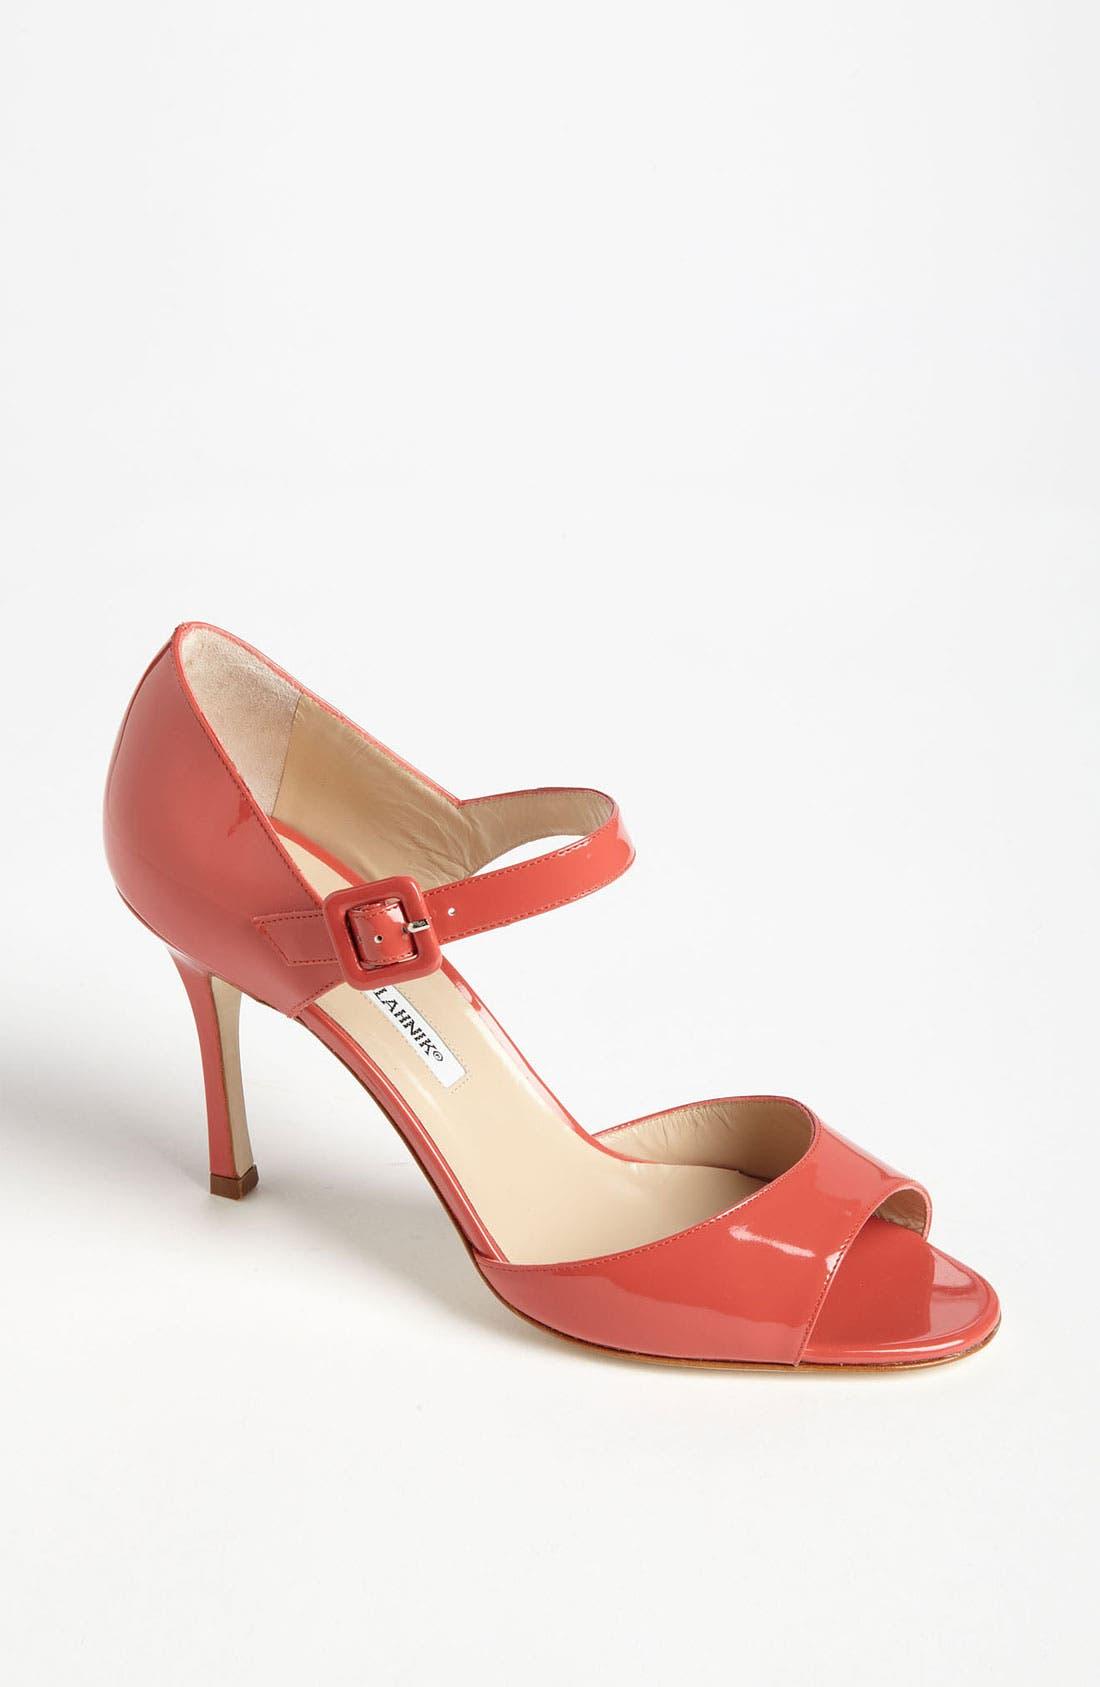 Main Image - Manolo Blahnik 'Caldo' Sandal